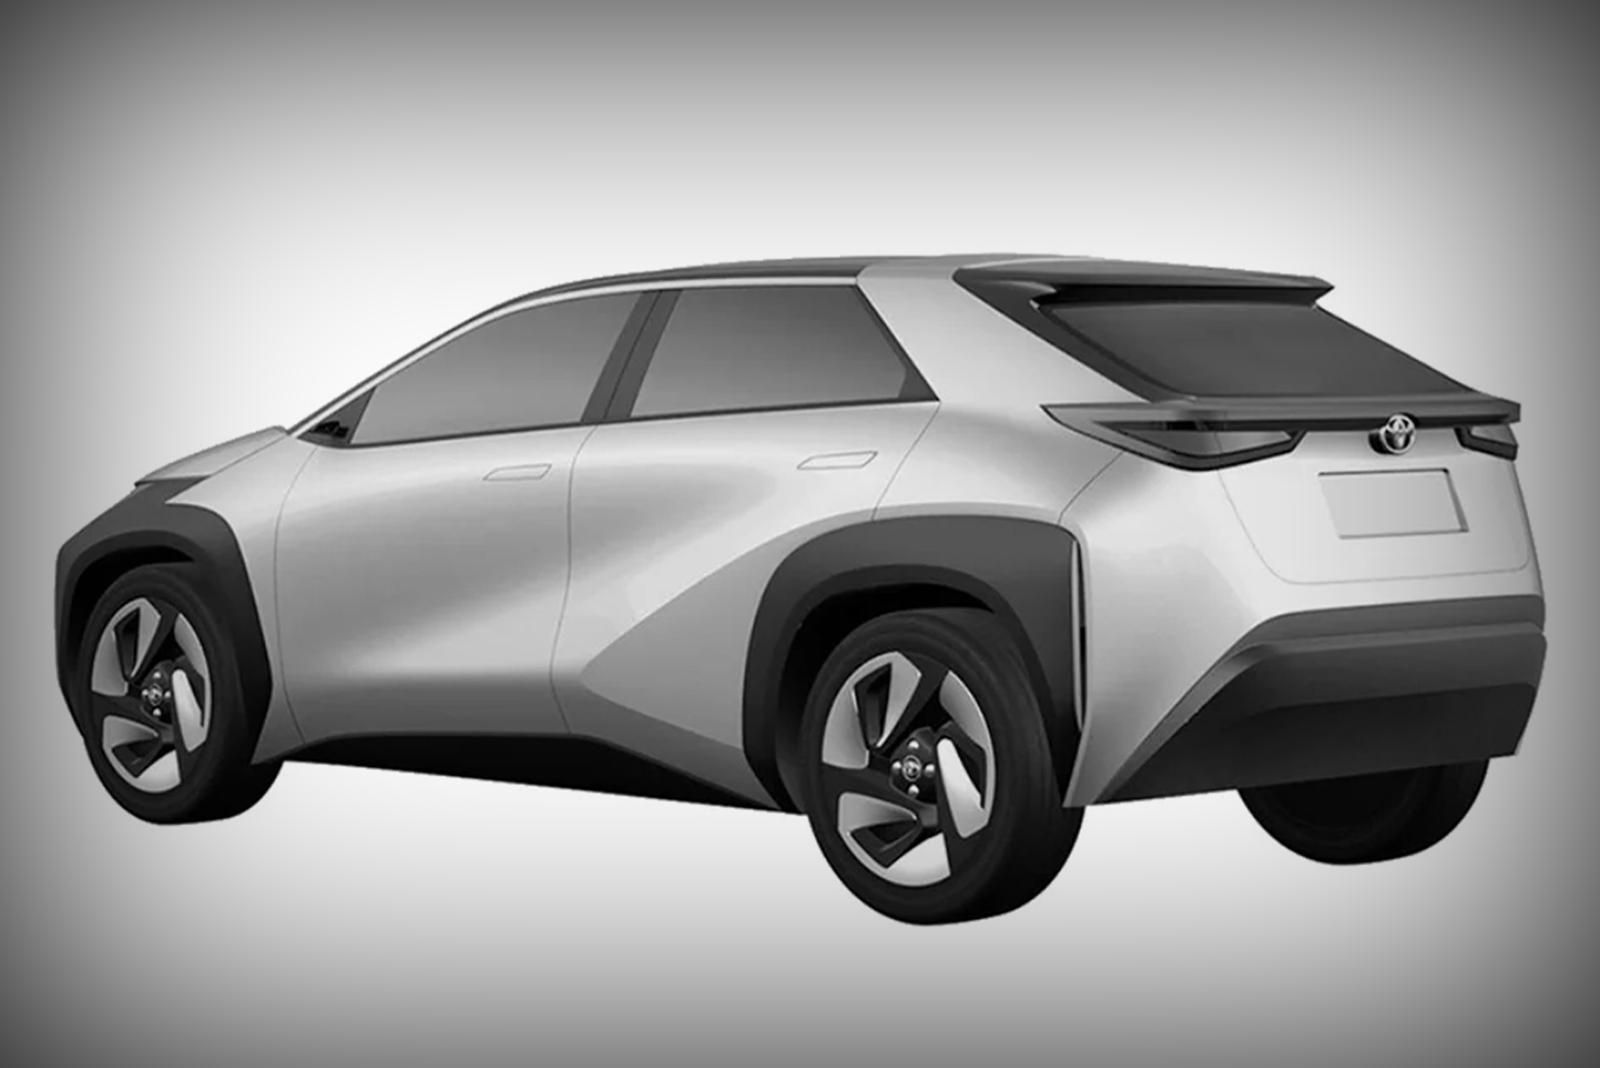 Kelebihan Kekurangan Crossover Toyota Review